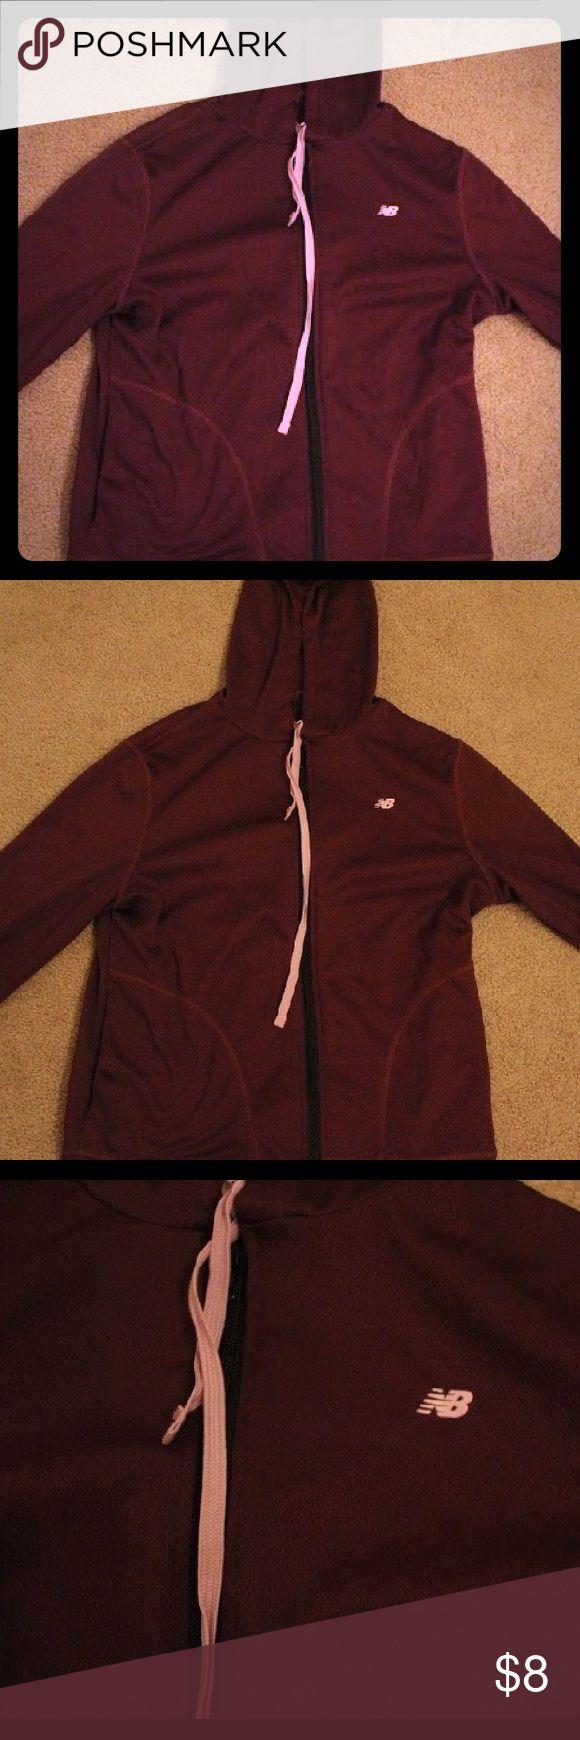 Women's new balance purple zip up workout hoodie Purple zip up workout hoodie. New Balance Tops Sweatshirts & Hoodies